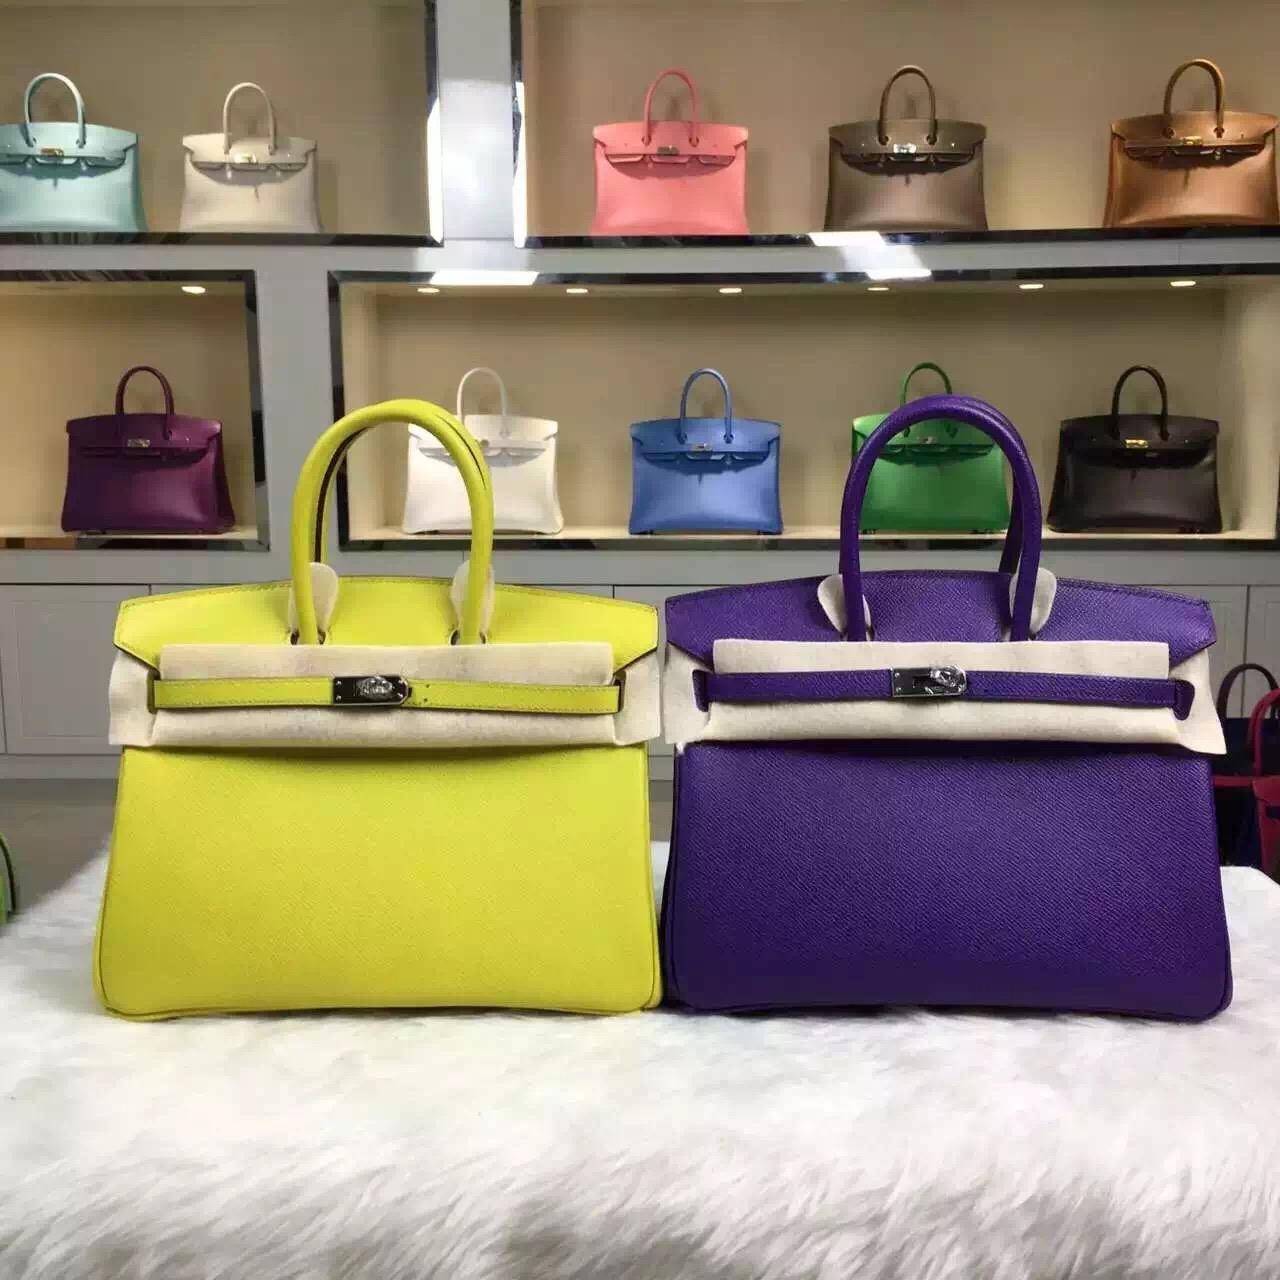 Luxury Hermes Original Epsom Leather Birkin Bag 25cm Lemon Yellow & Ultraviolet